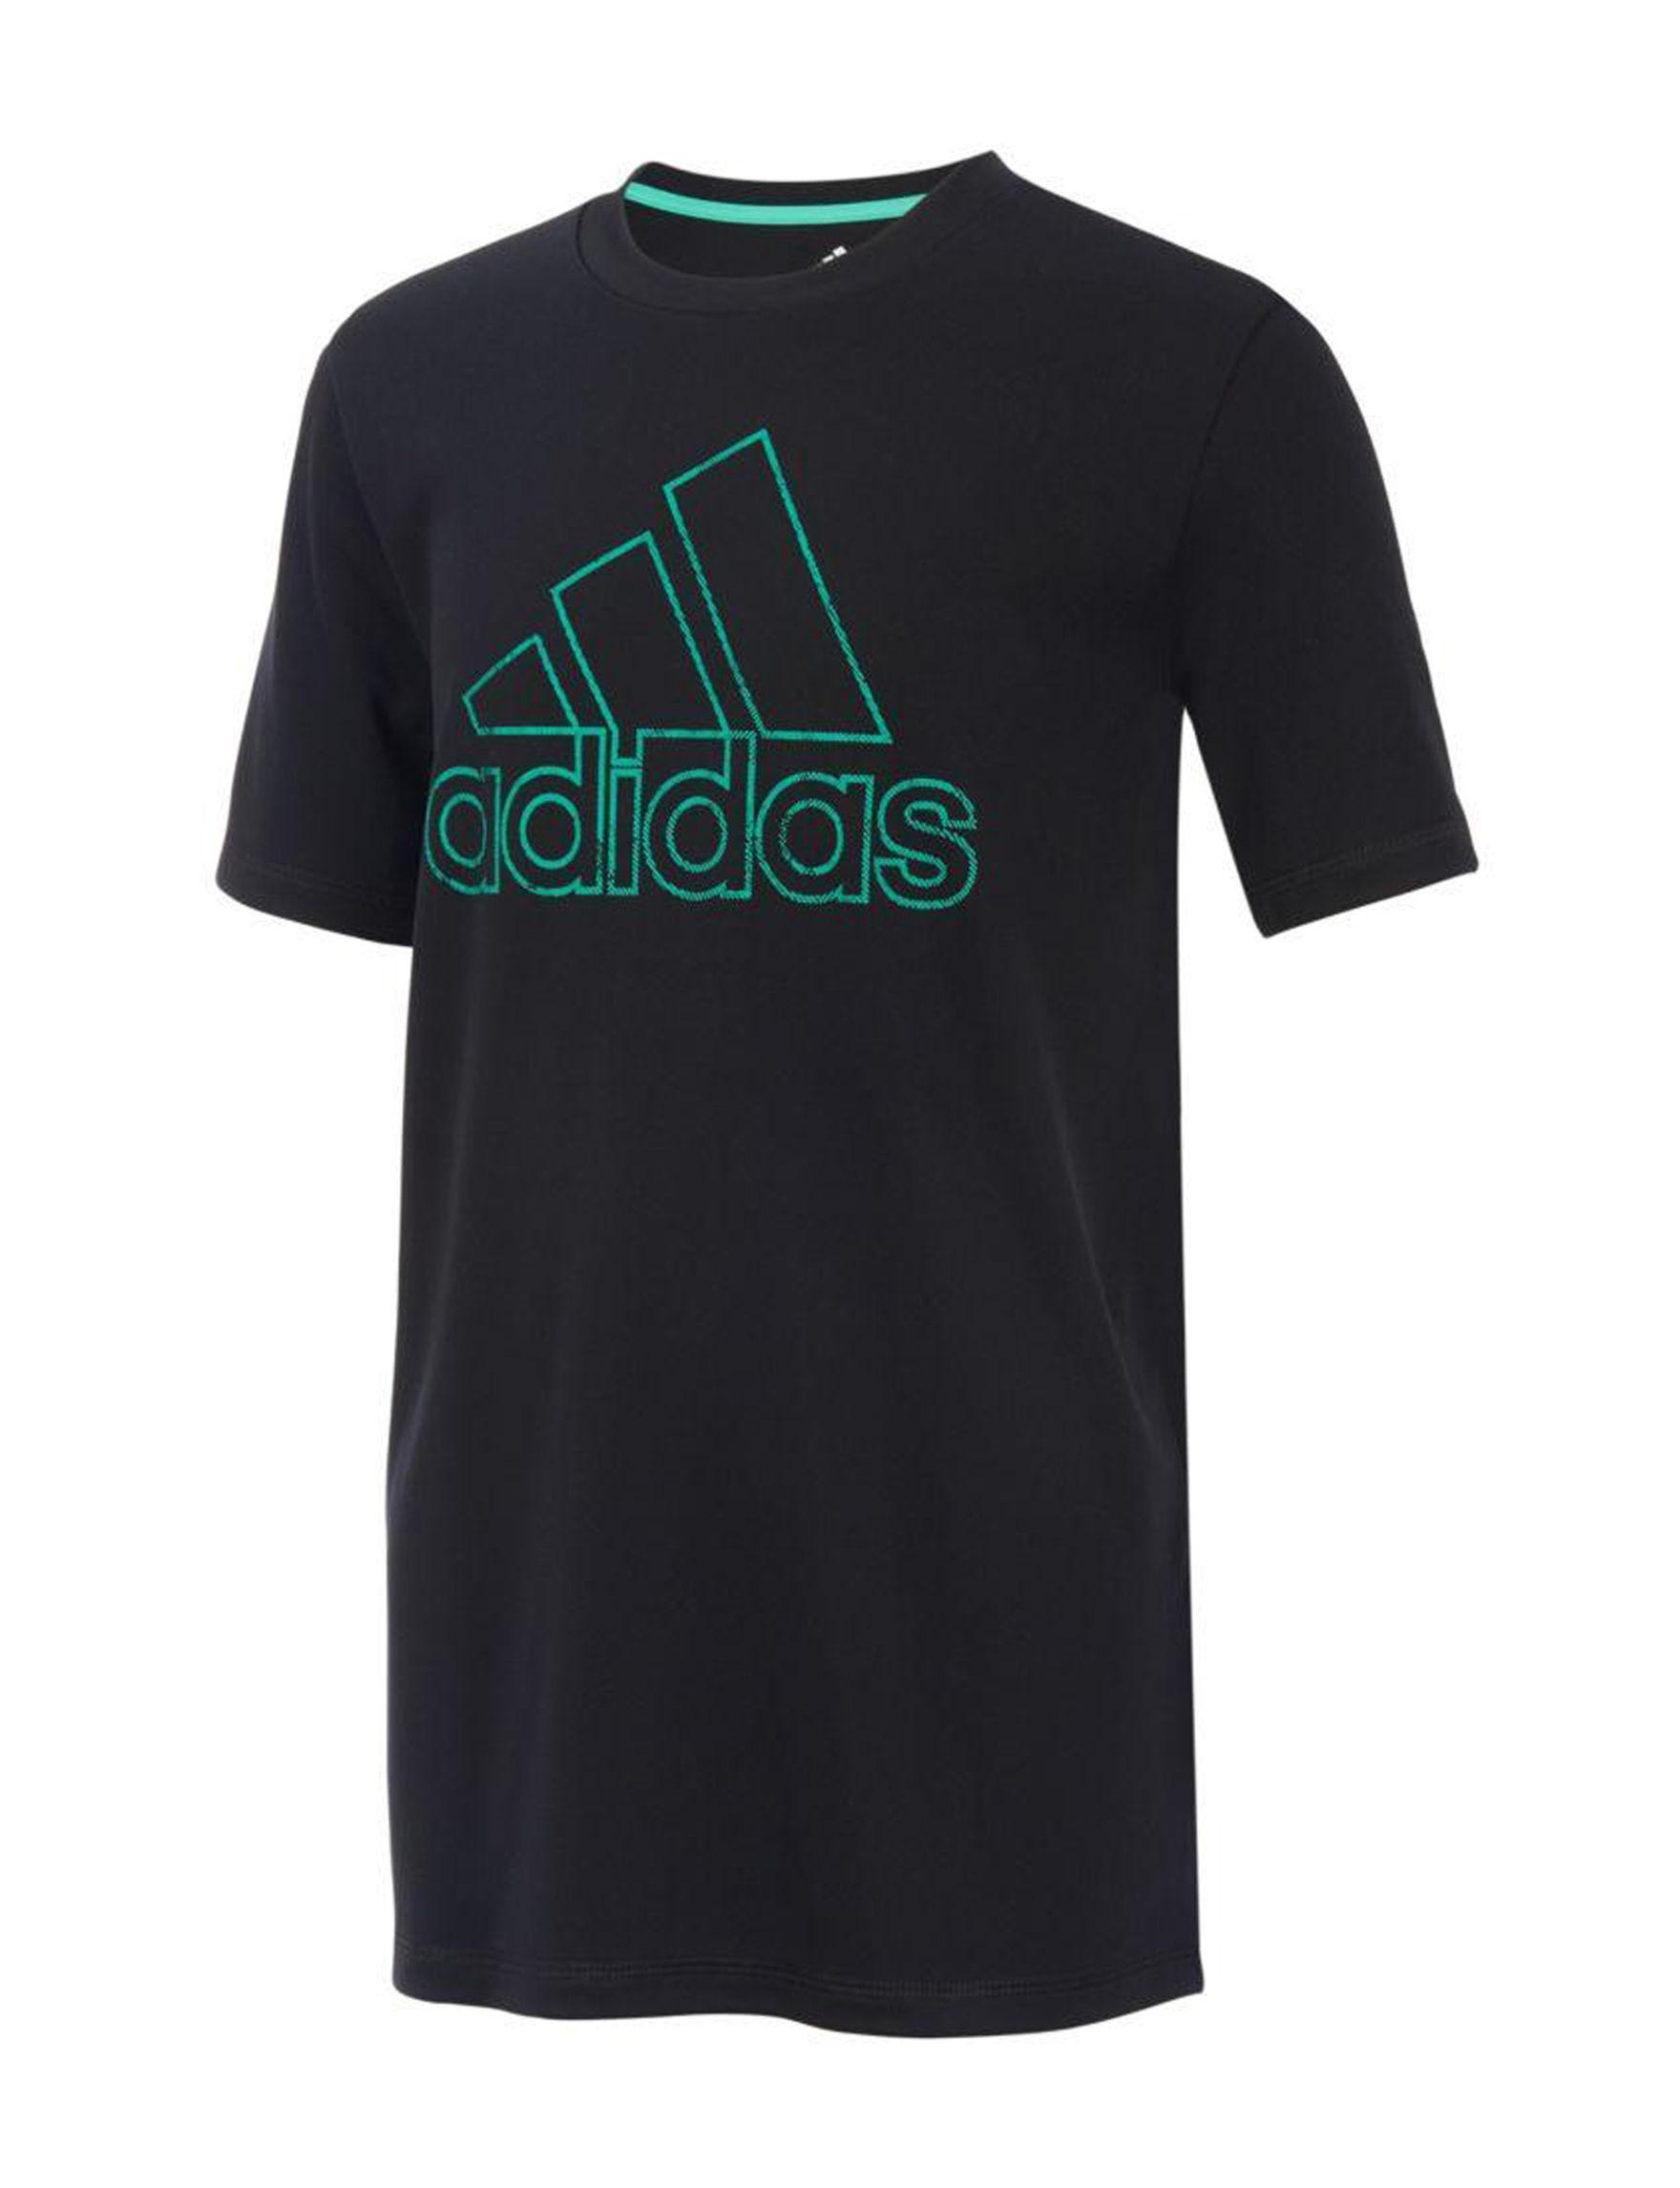 Adidas Black / Green